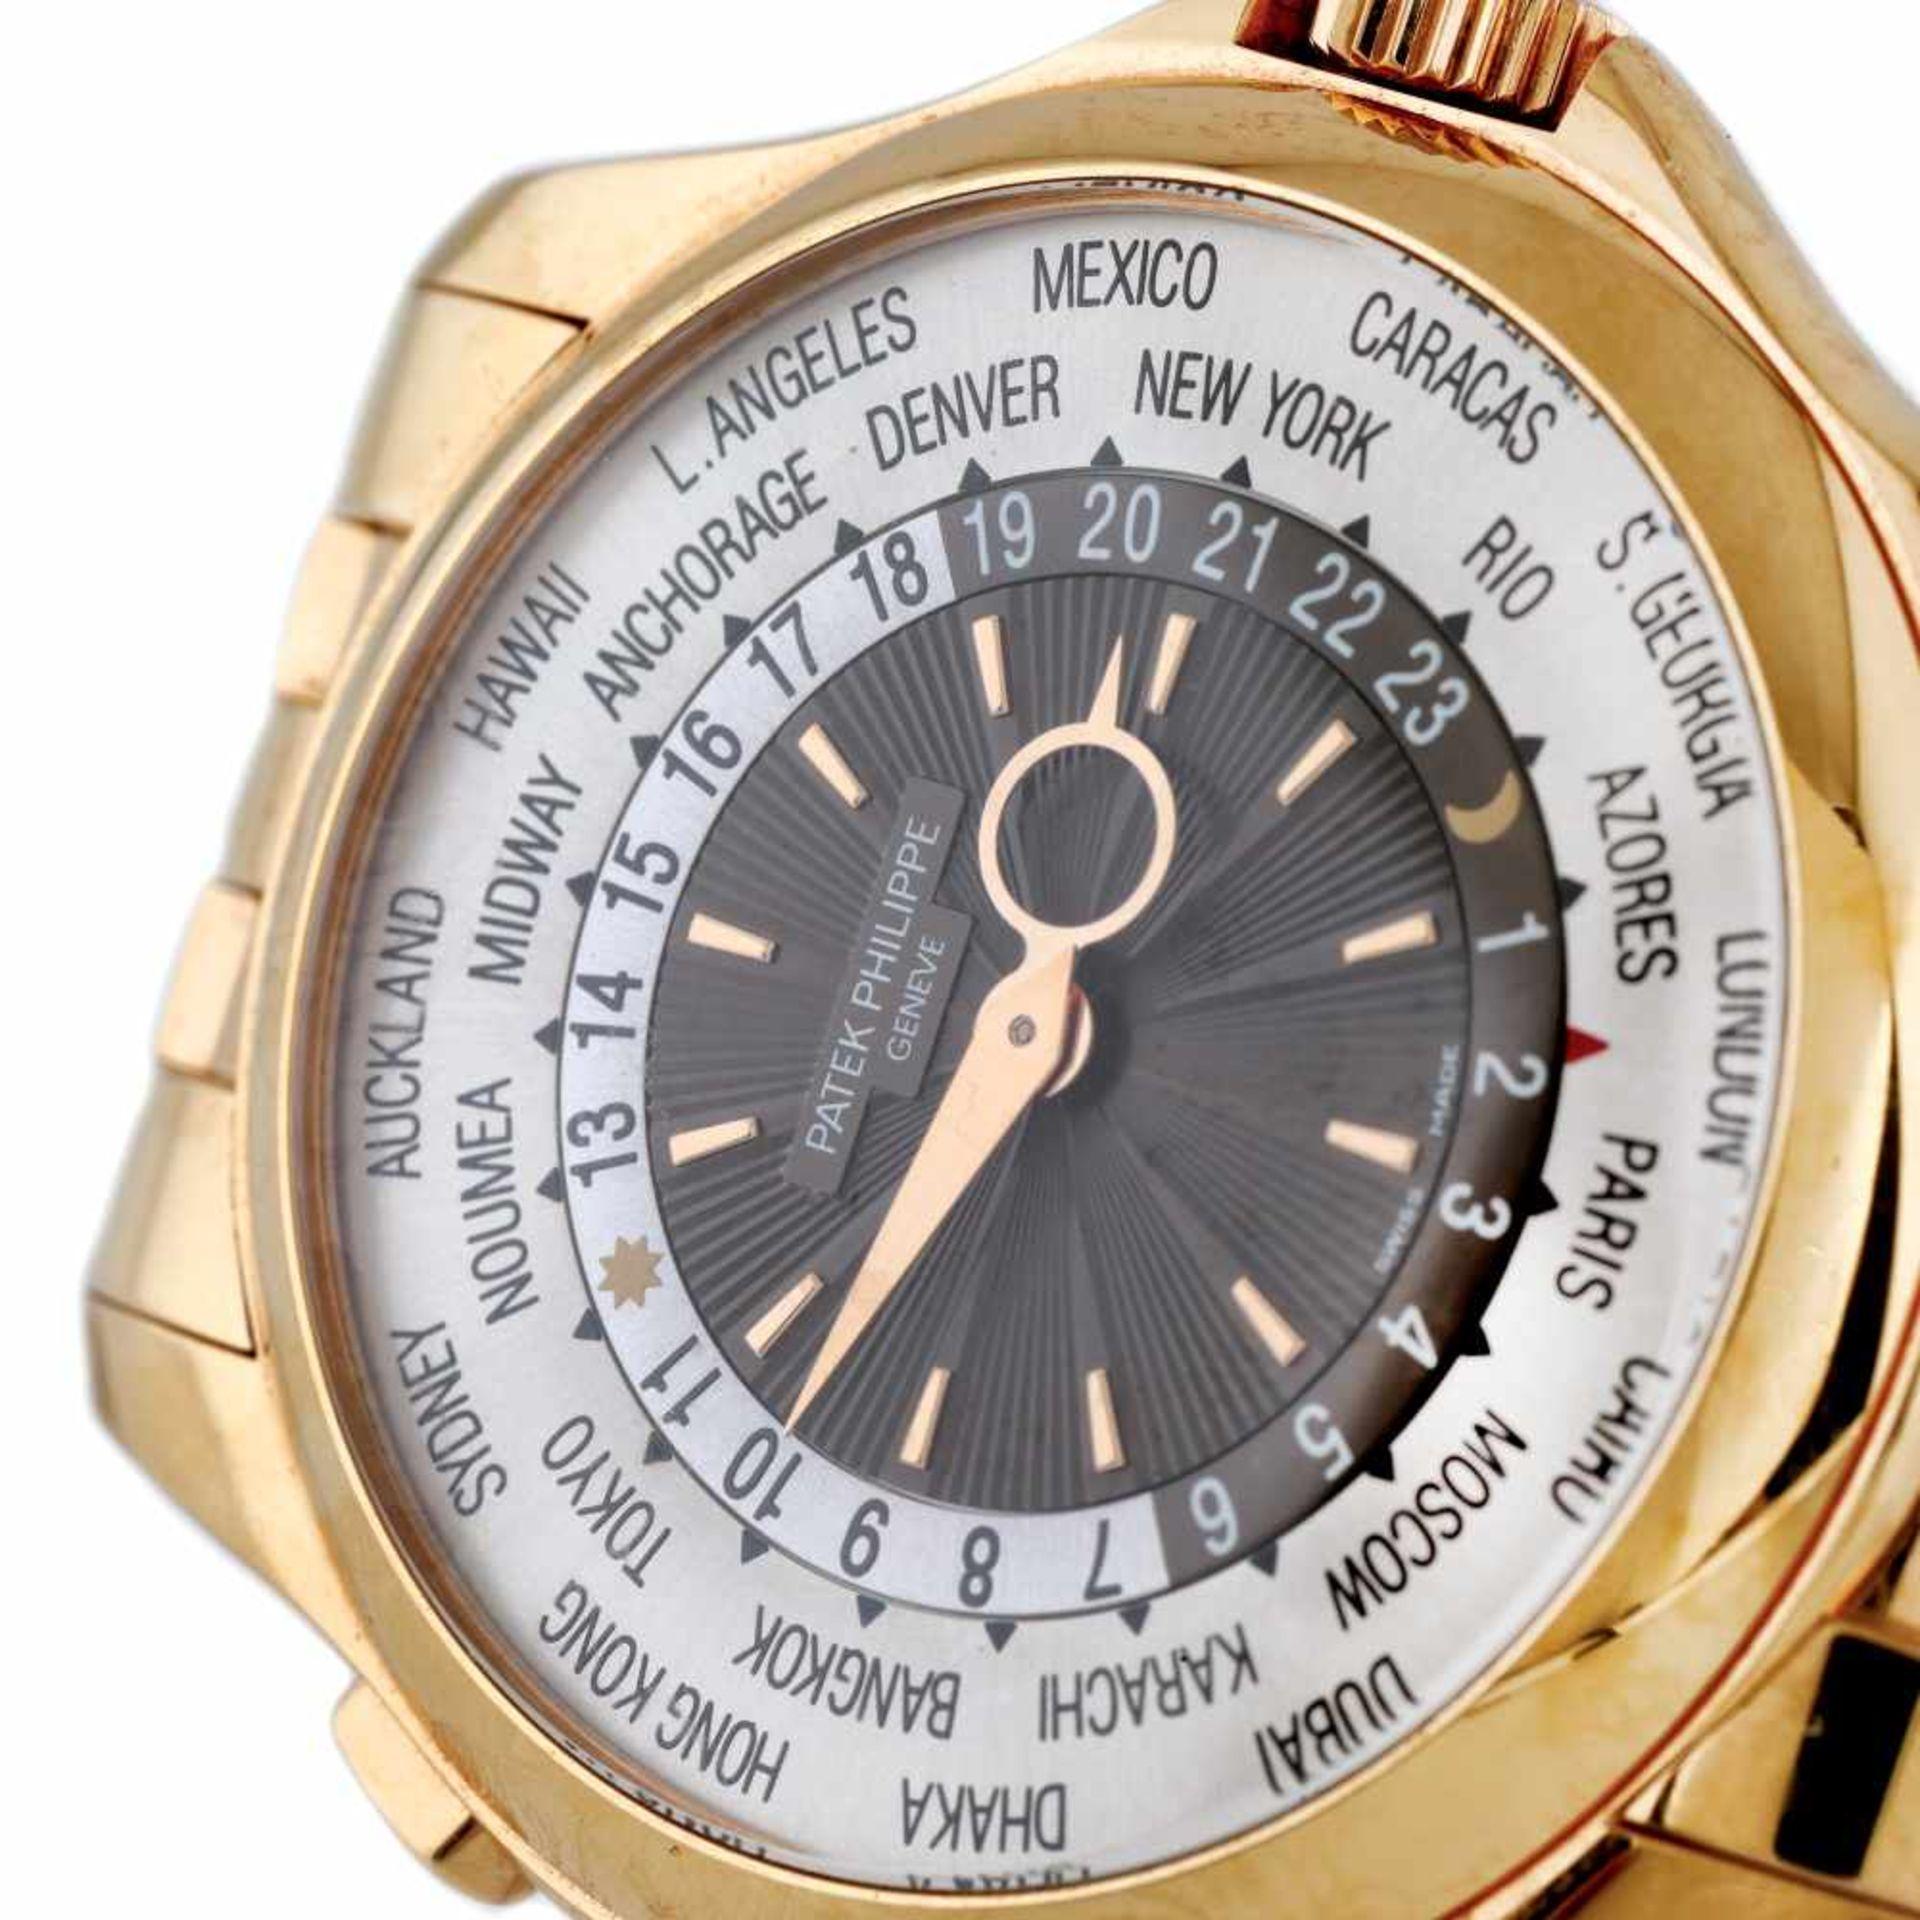 Patek Phillipe World Time wristwatch, gold, men, provenance documents and original box - Bild 2 aus 3